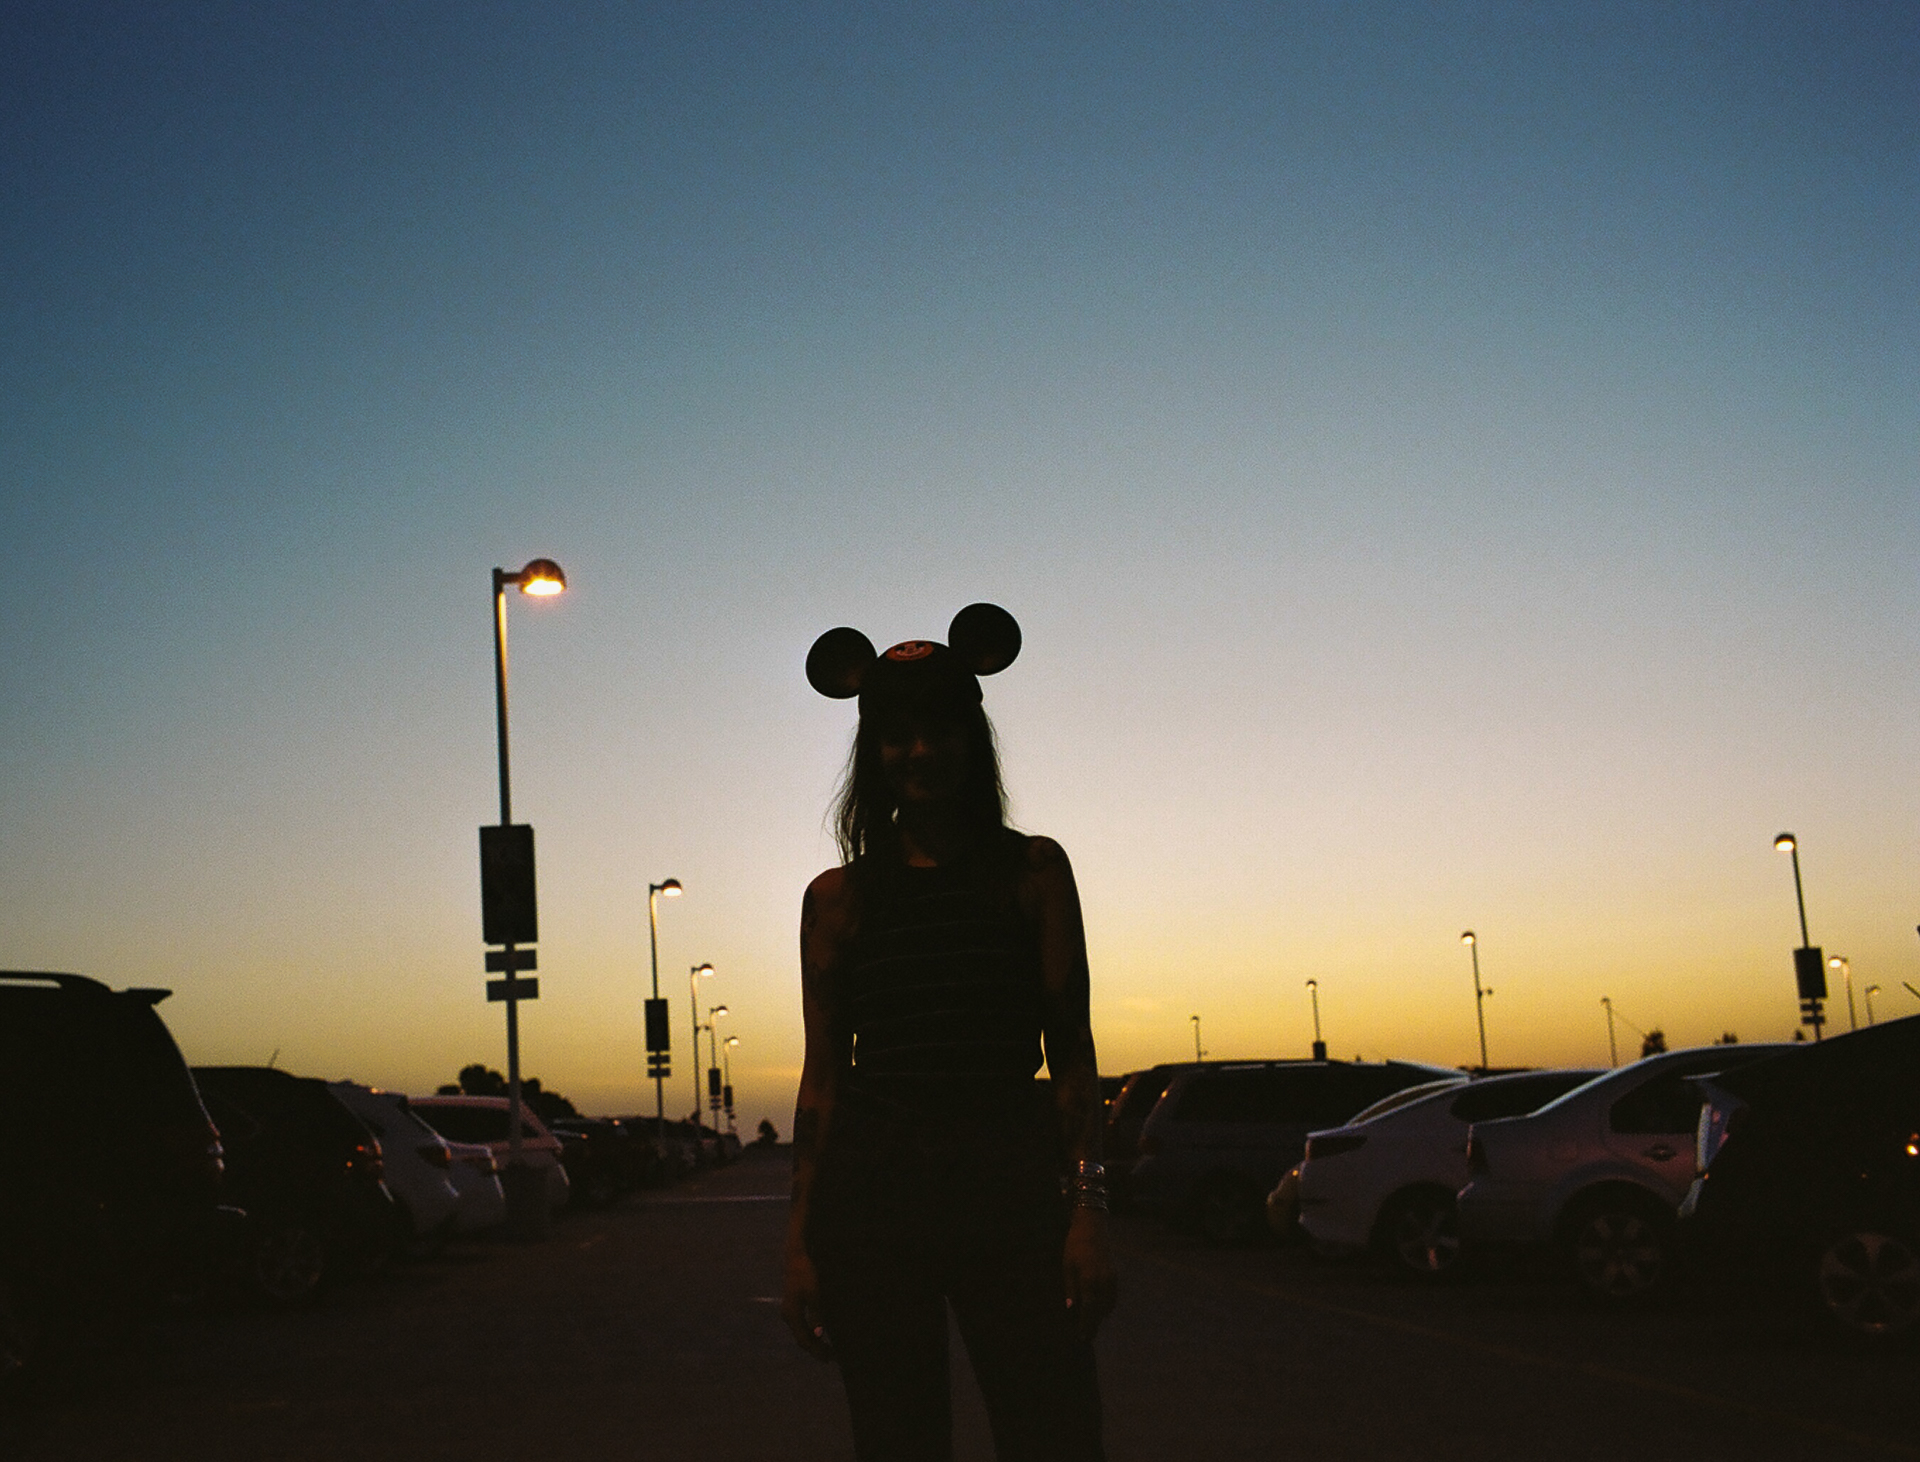 051117_JakePrice_Disneyland-42180028.jpg